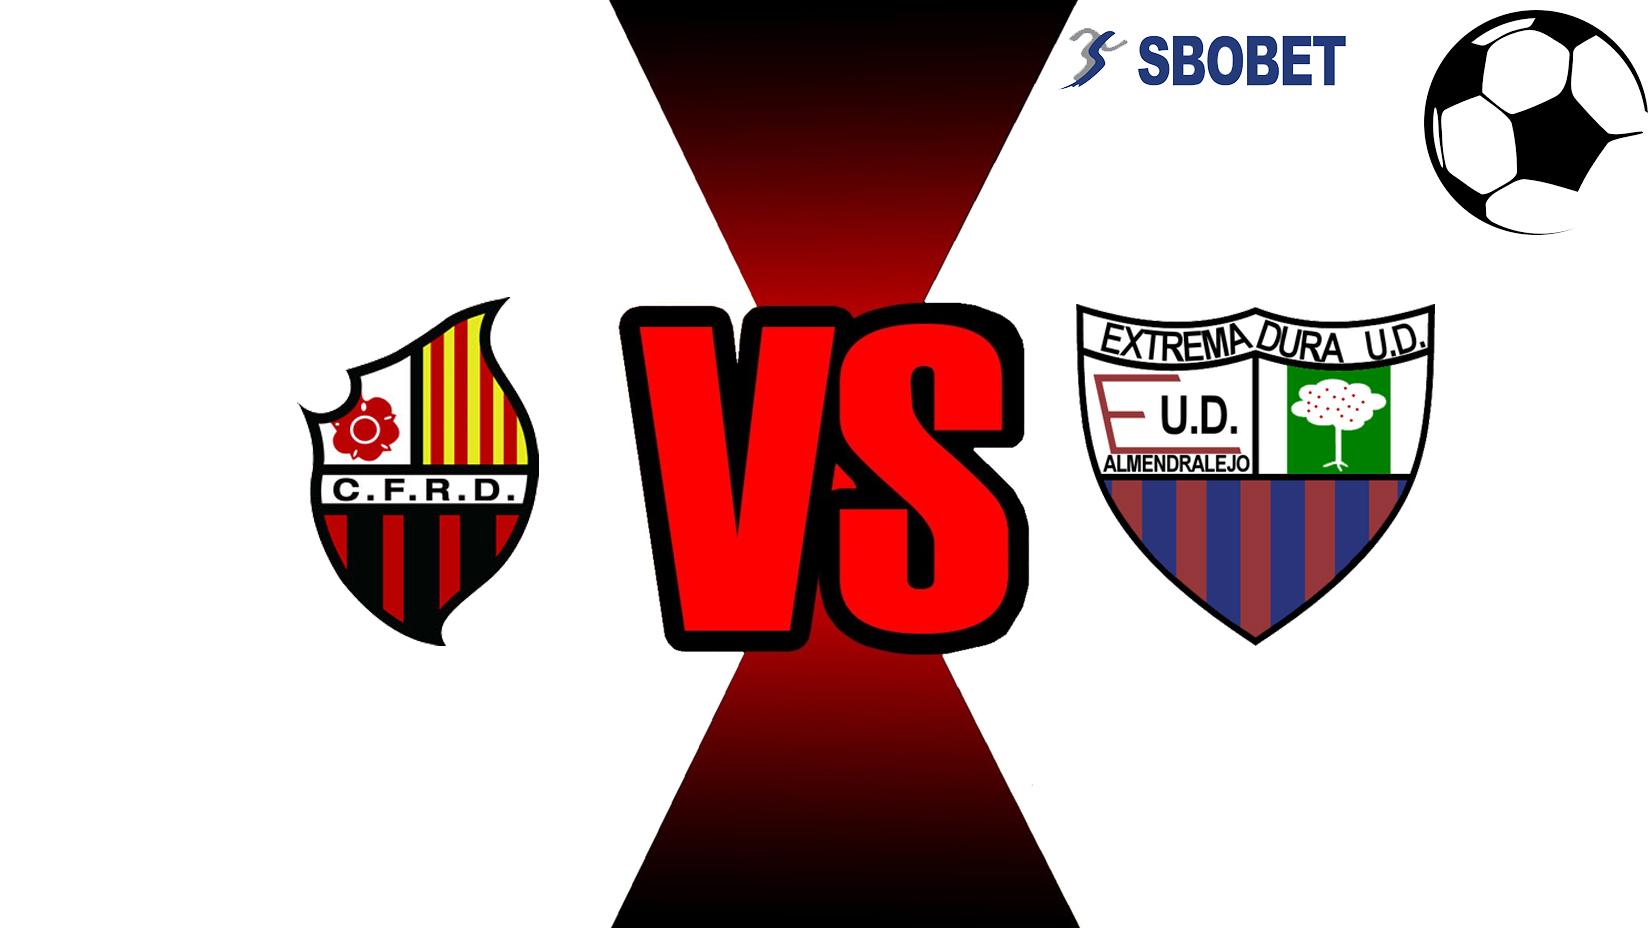 Prediksi Skor Bola Online Reus vs Extremadura 18 November 2018